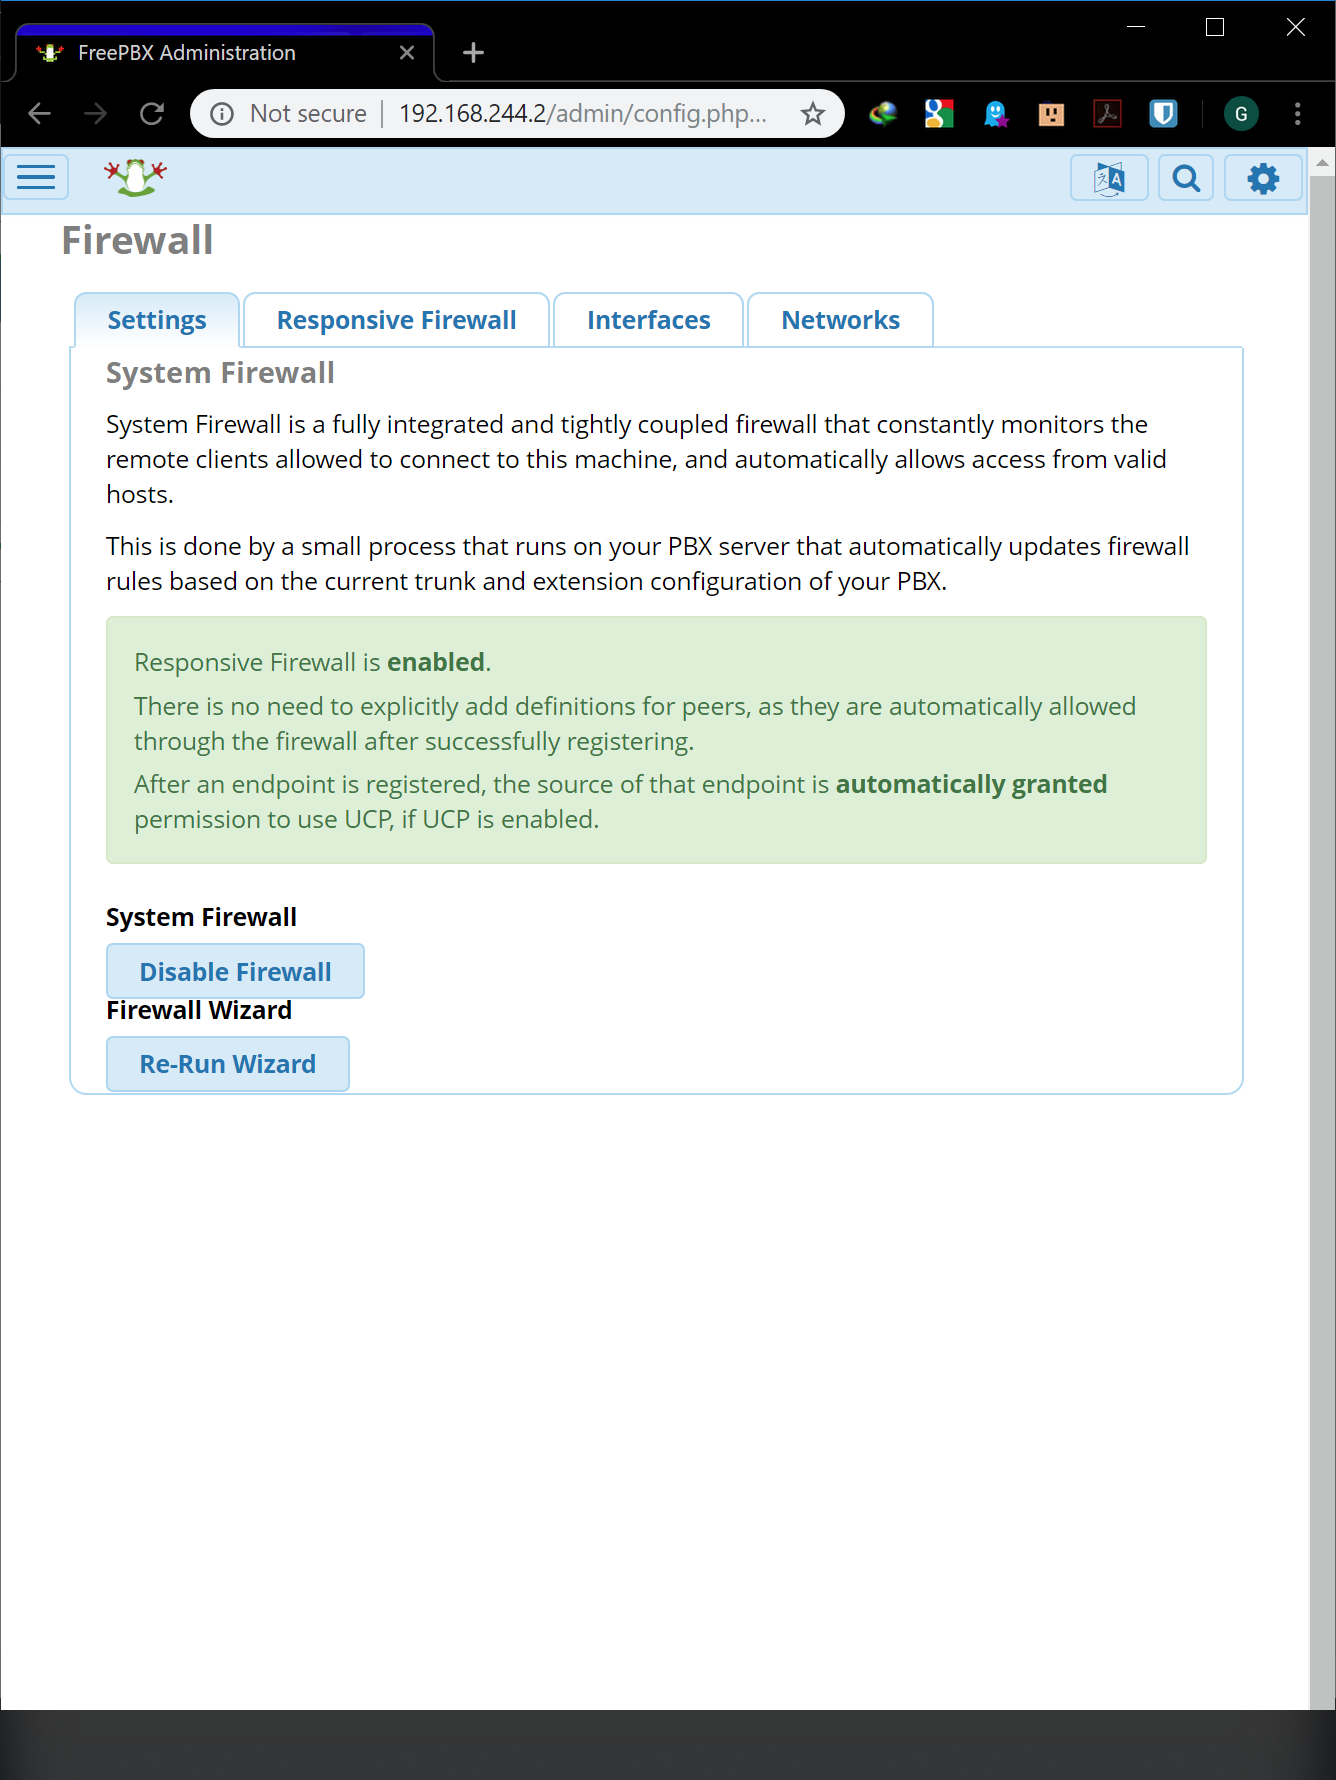 FREEPBX-19933] Firewall submenu missing on mobile devices/ narrow